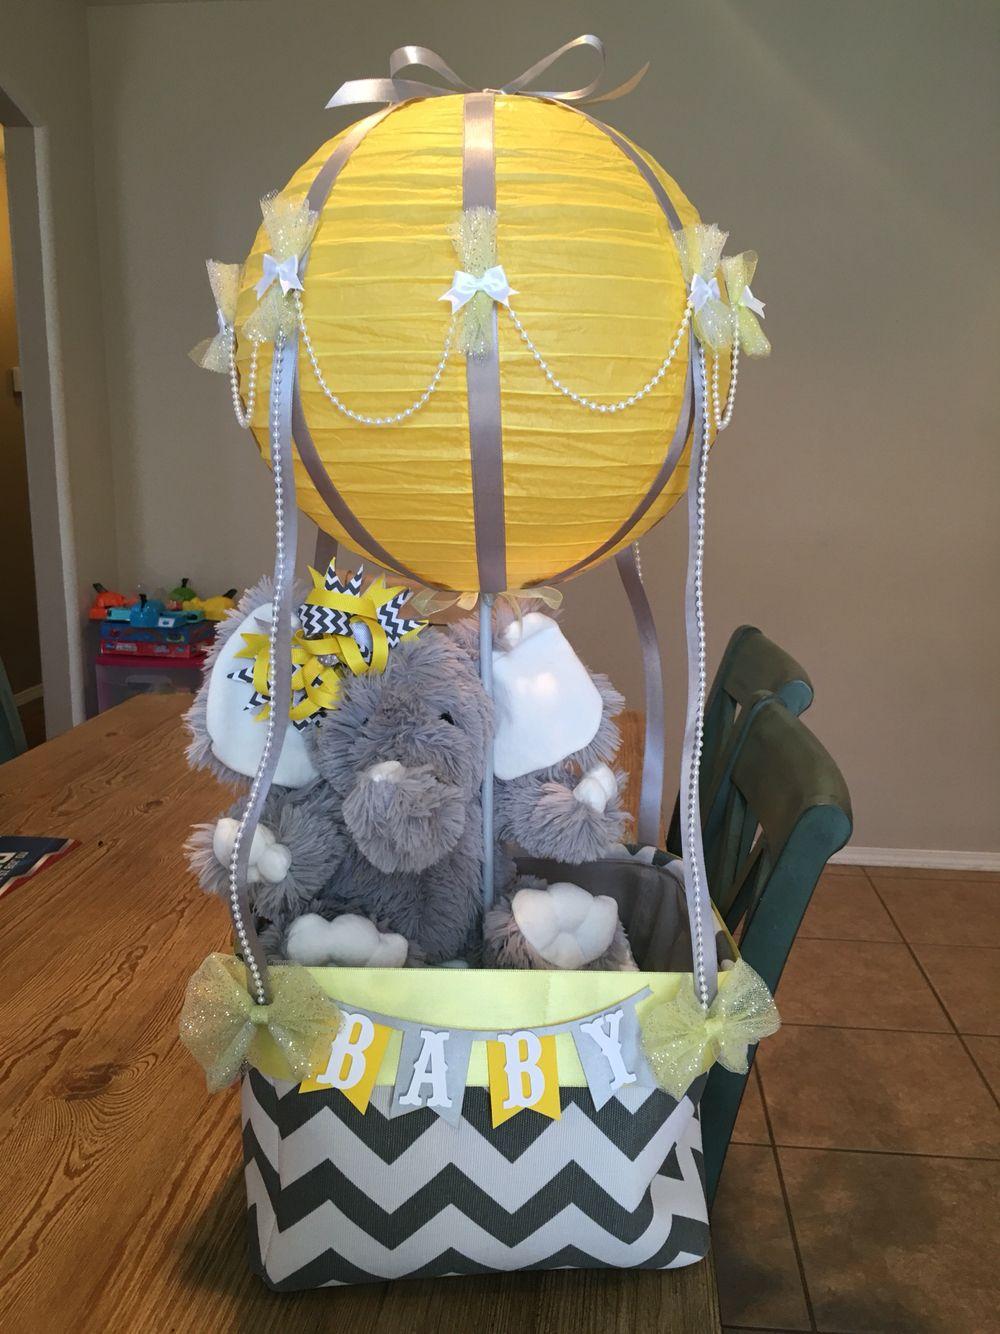 Gender neutral baby shower ideas pinterest - Gender Neutral Baby Shower Hot Air Balloon Yellow Grey Baby Shower Elephant Themed